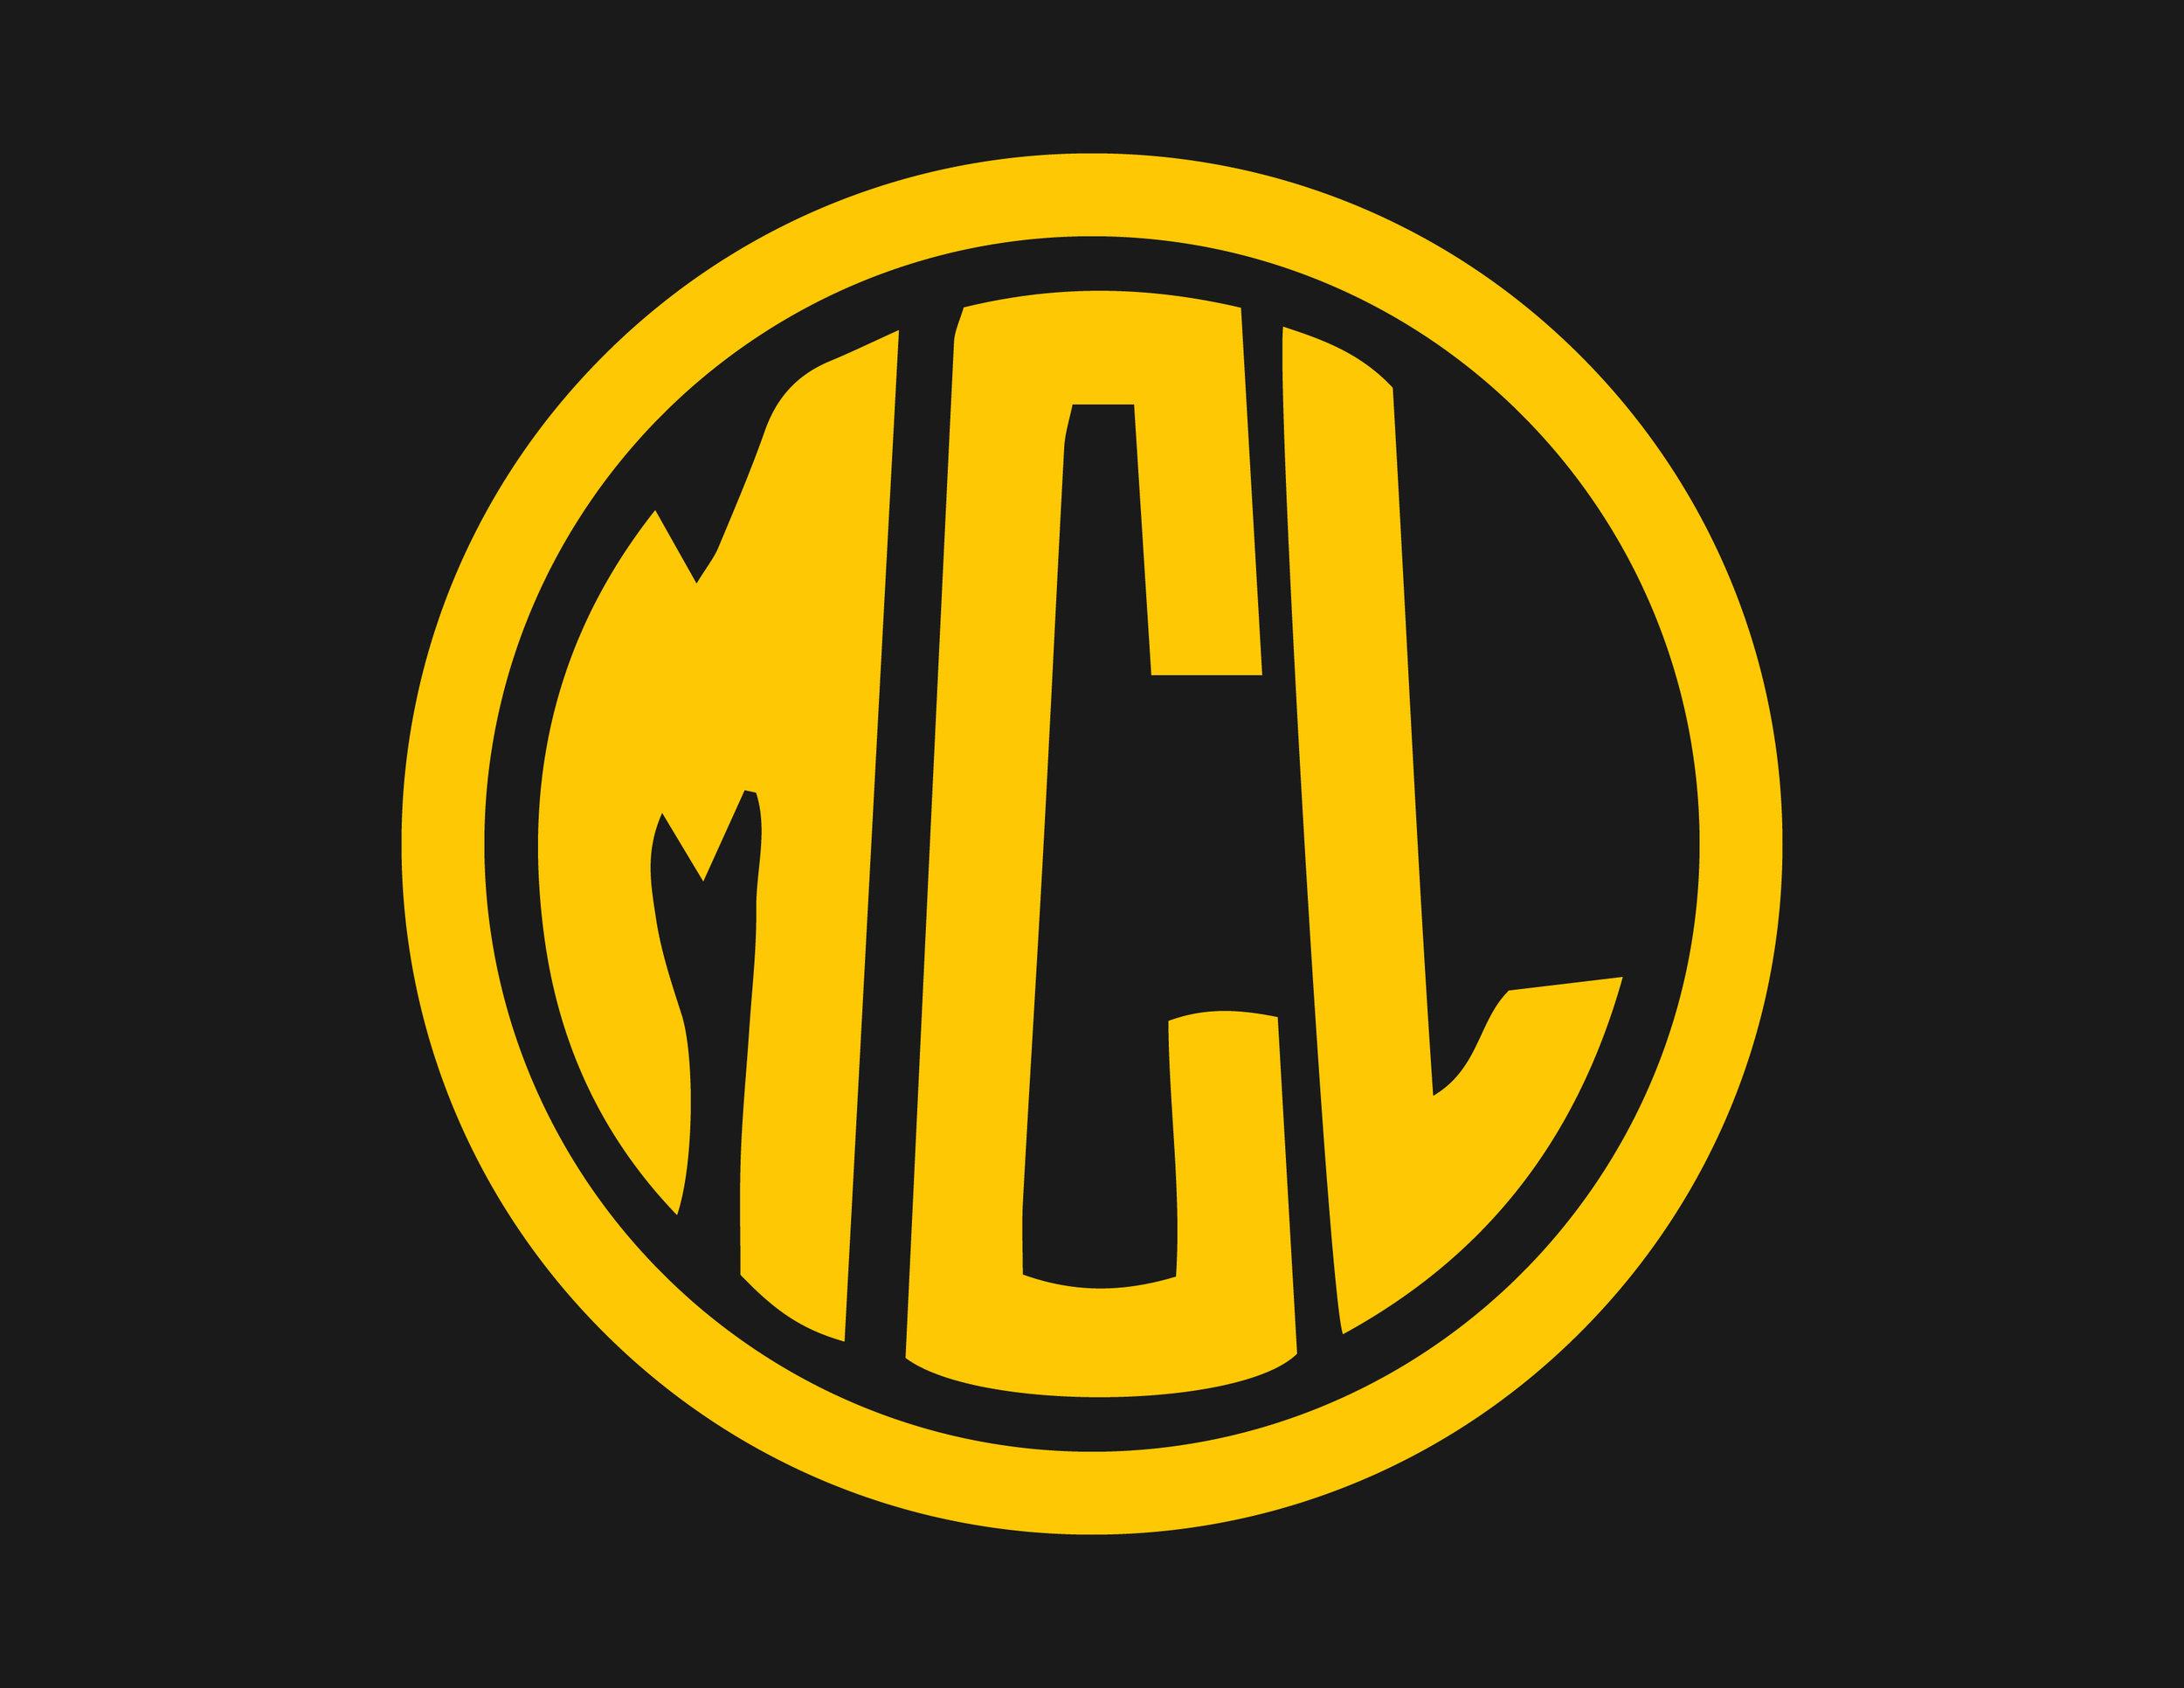 MCL stamp - YoG-01.jpg